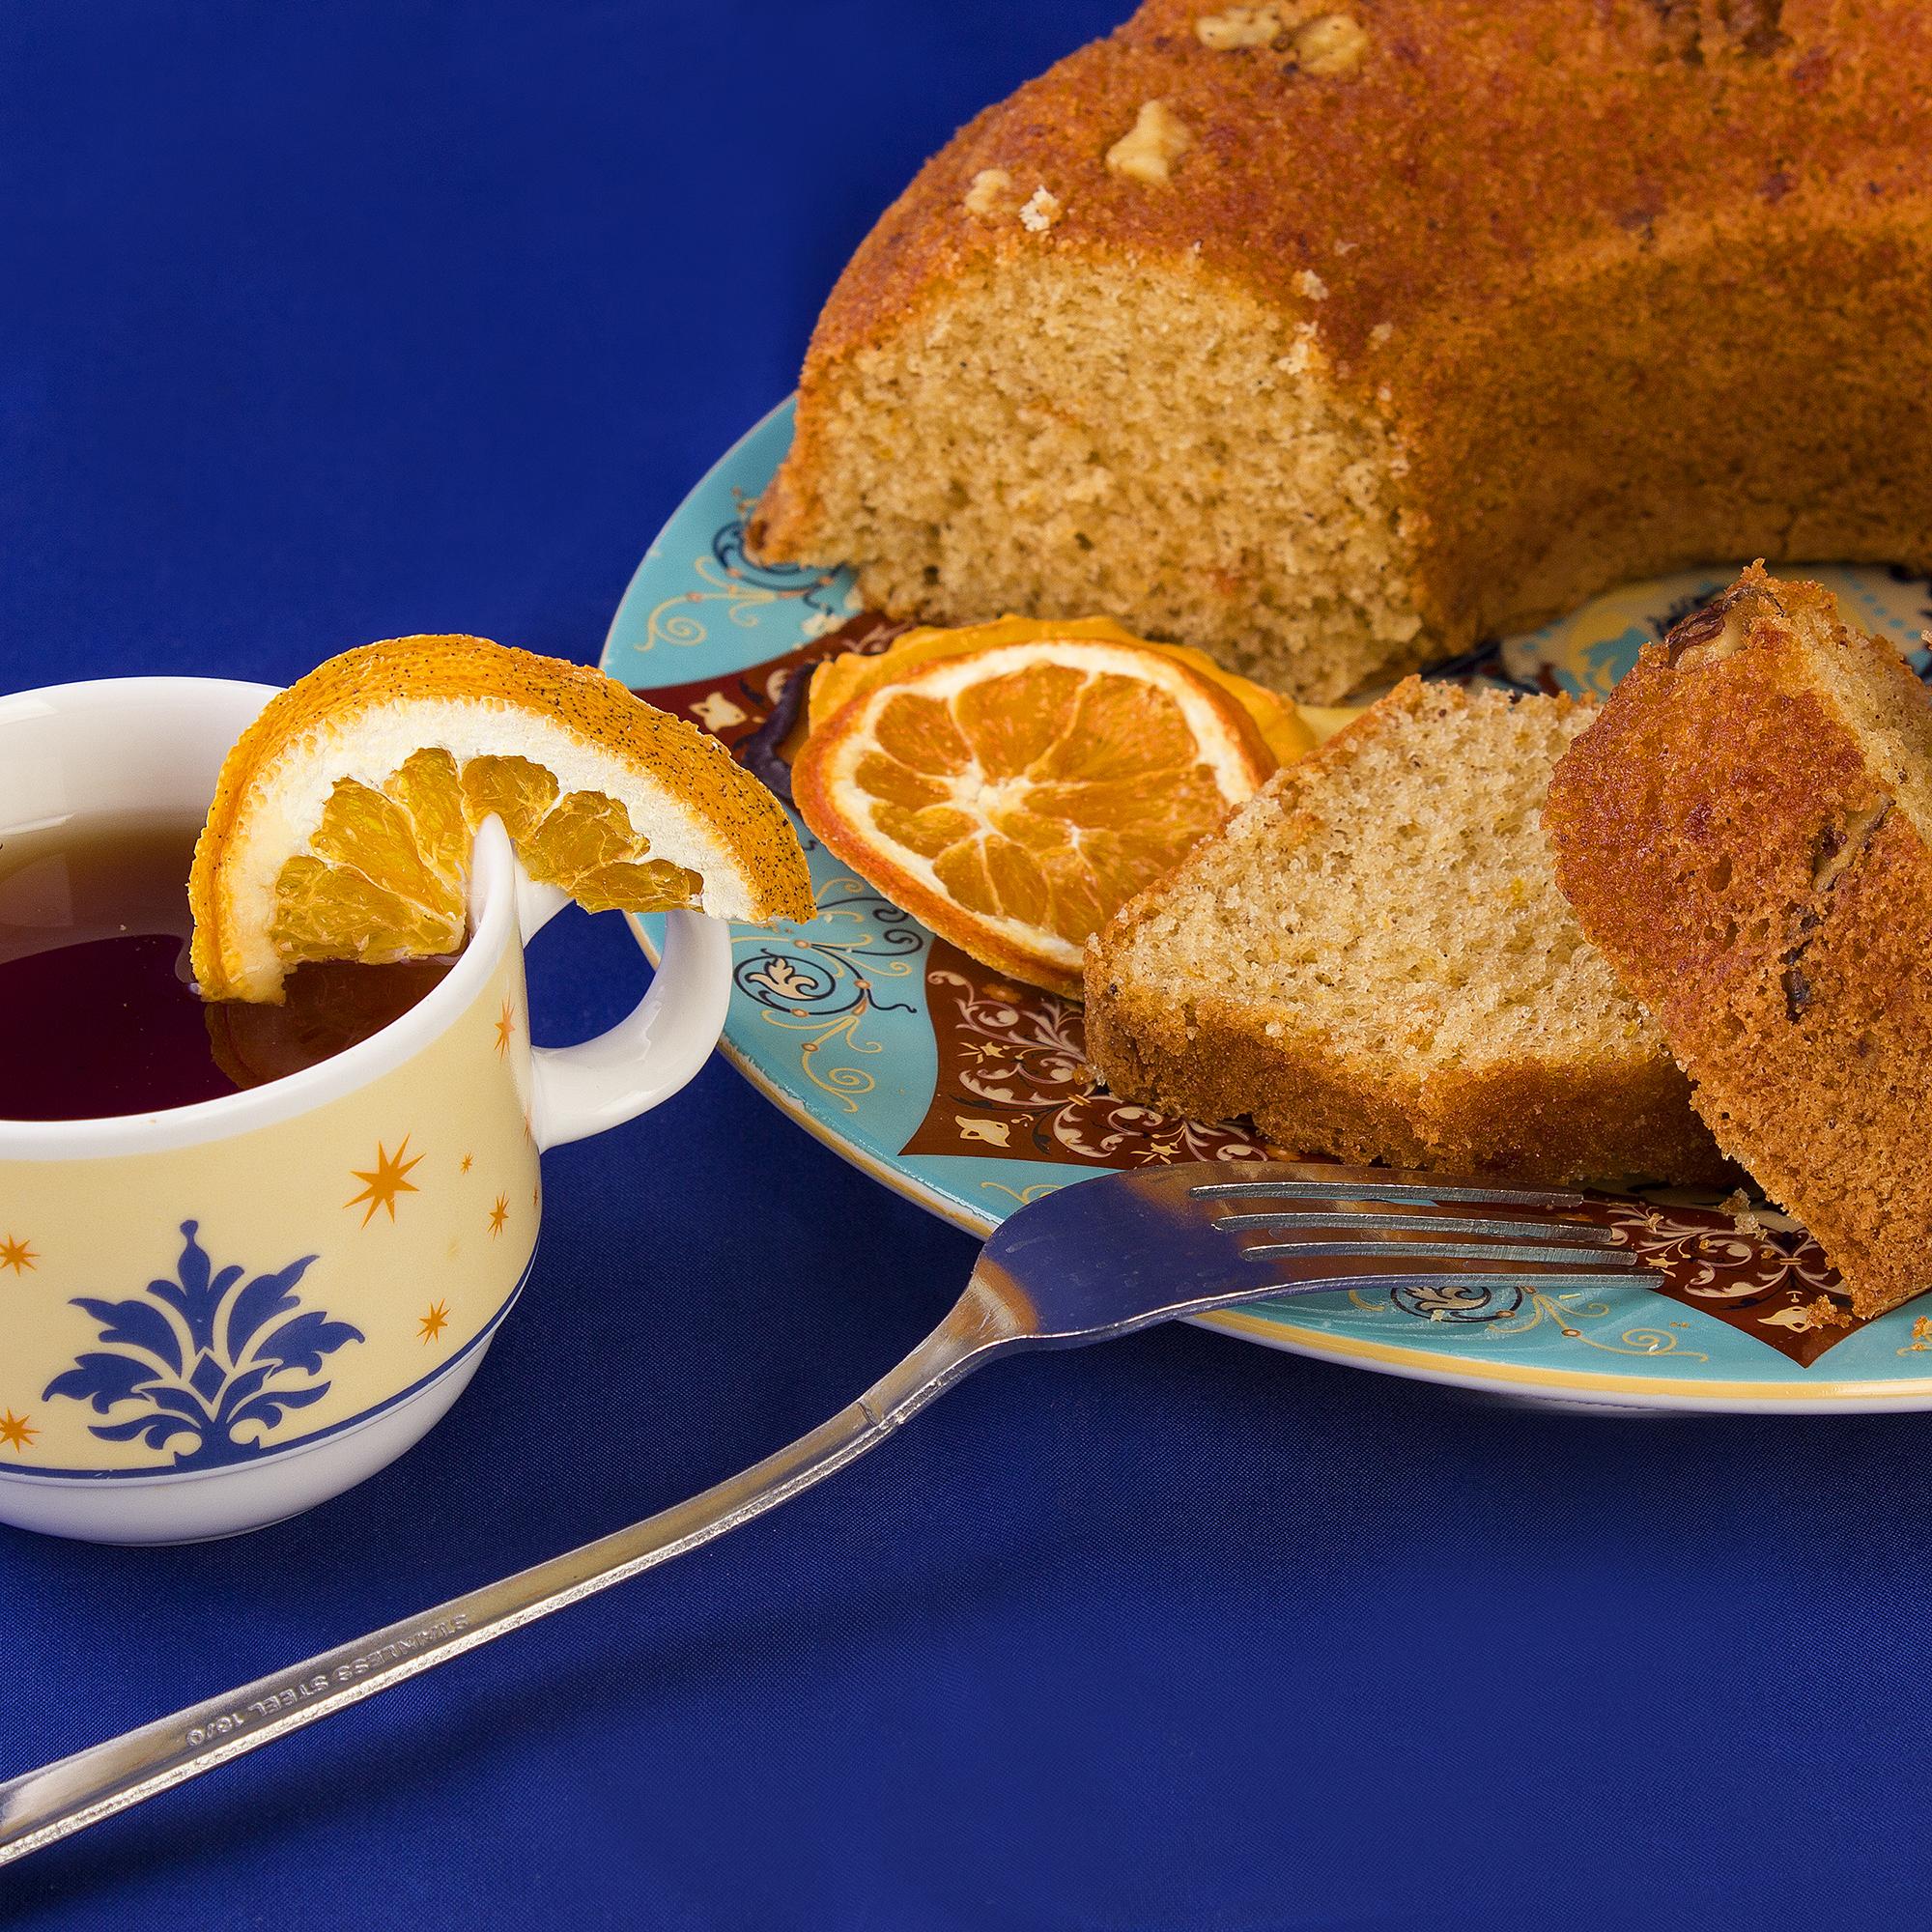 کیک روغنی هویج گردو مهفام - 620 گرم  main 1 8